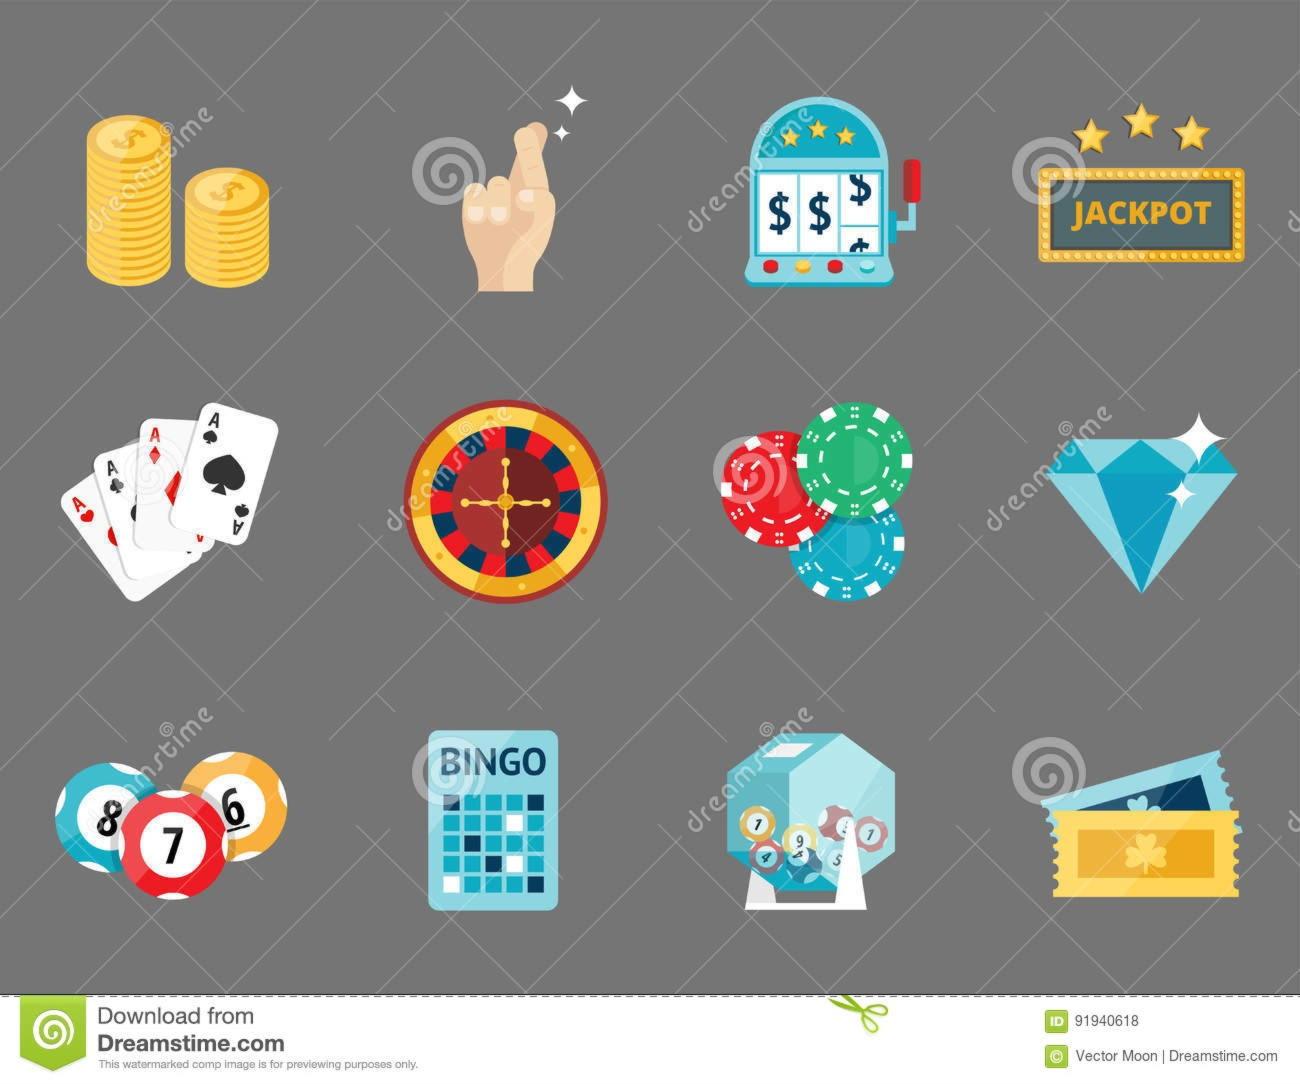 66 FREE Spins at Genesis Casino